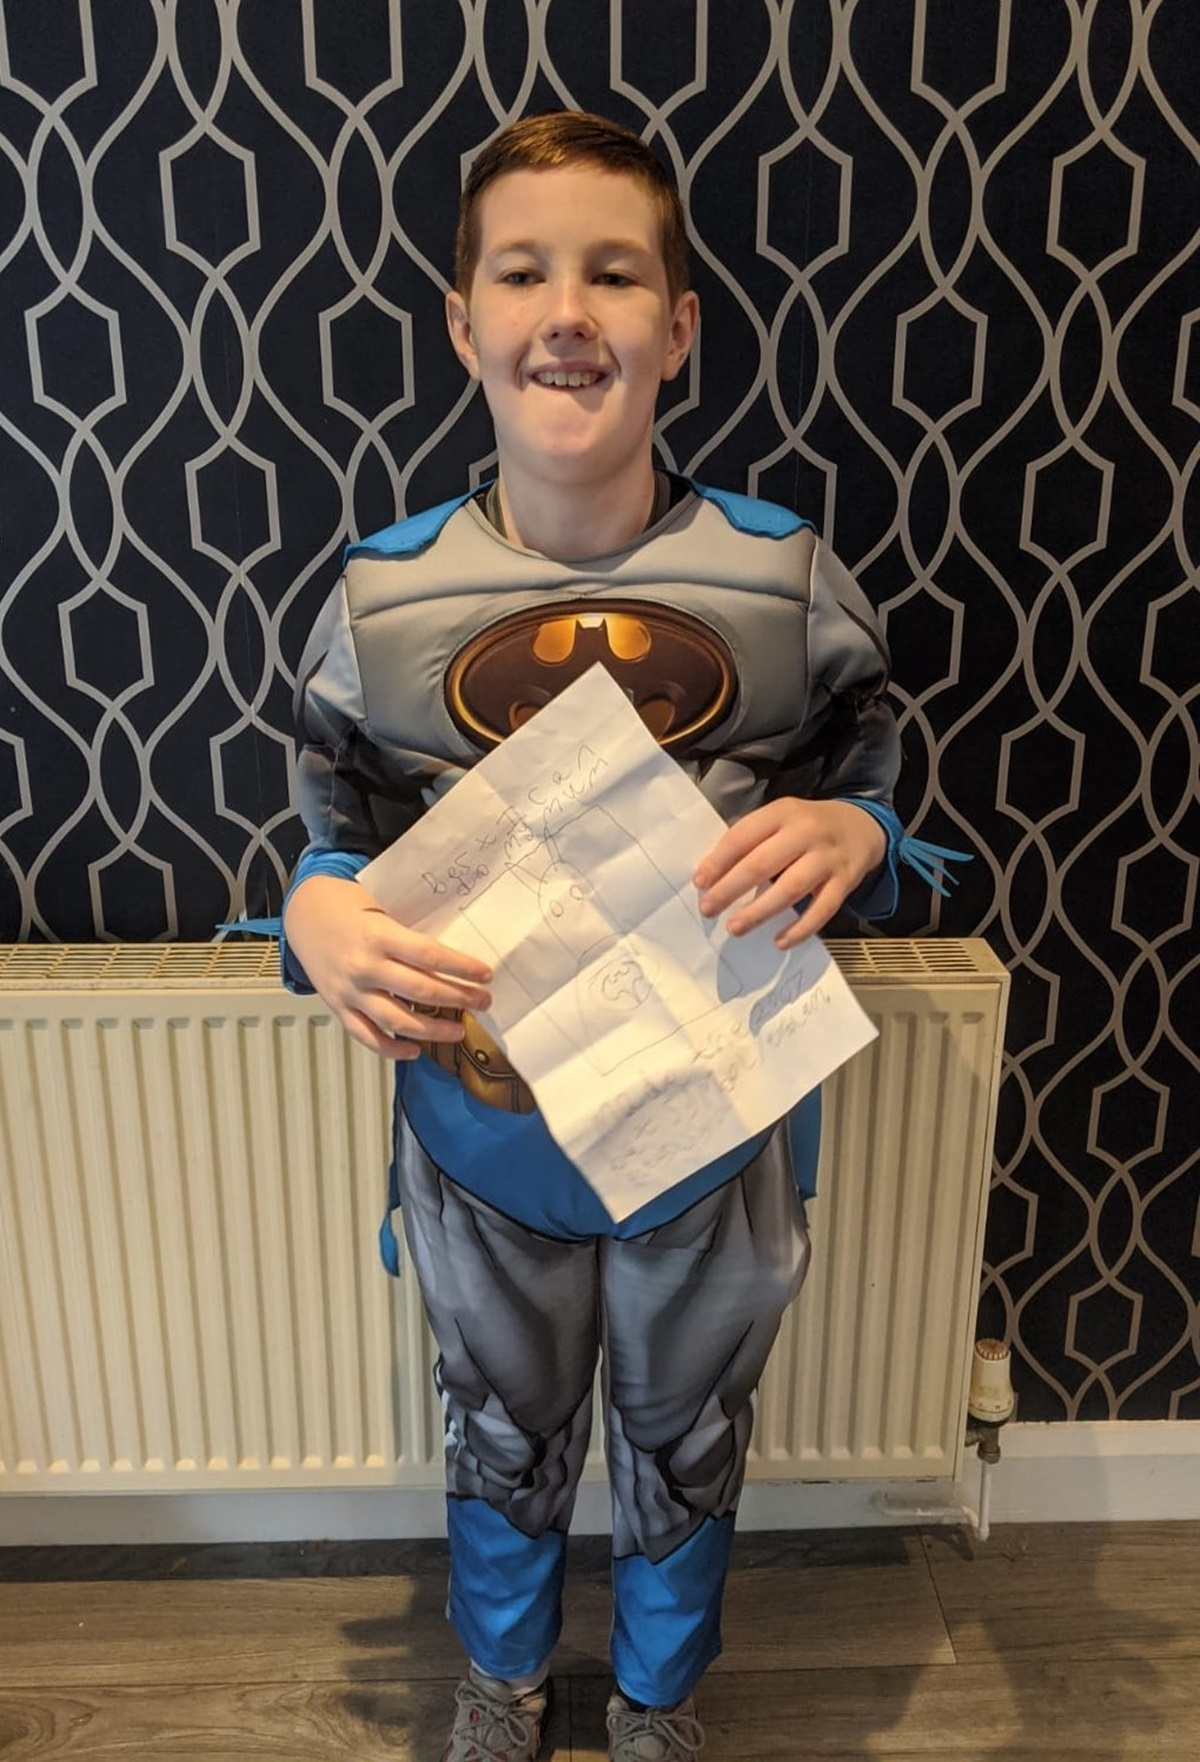 Роберт Паттинсон осчастливил 10-летнего фаната, сделав ему сюрприз - фото №3